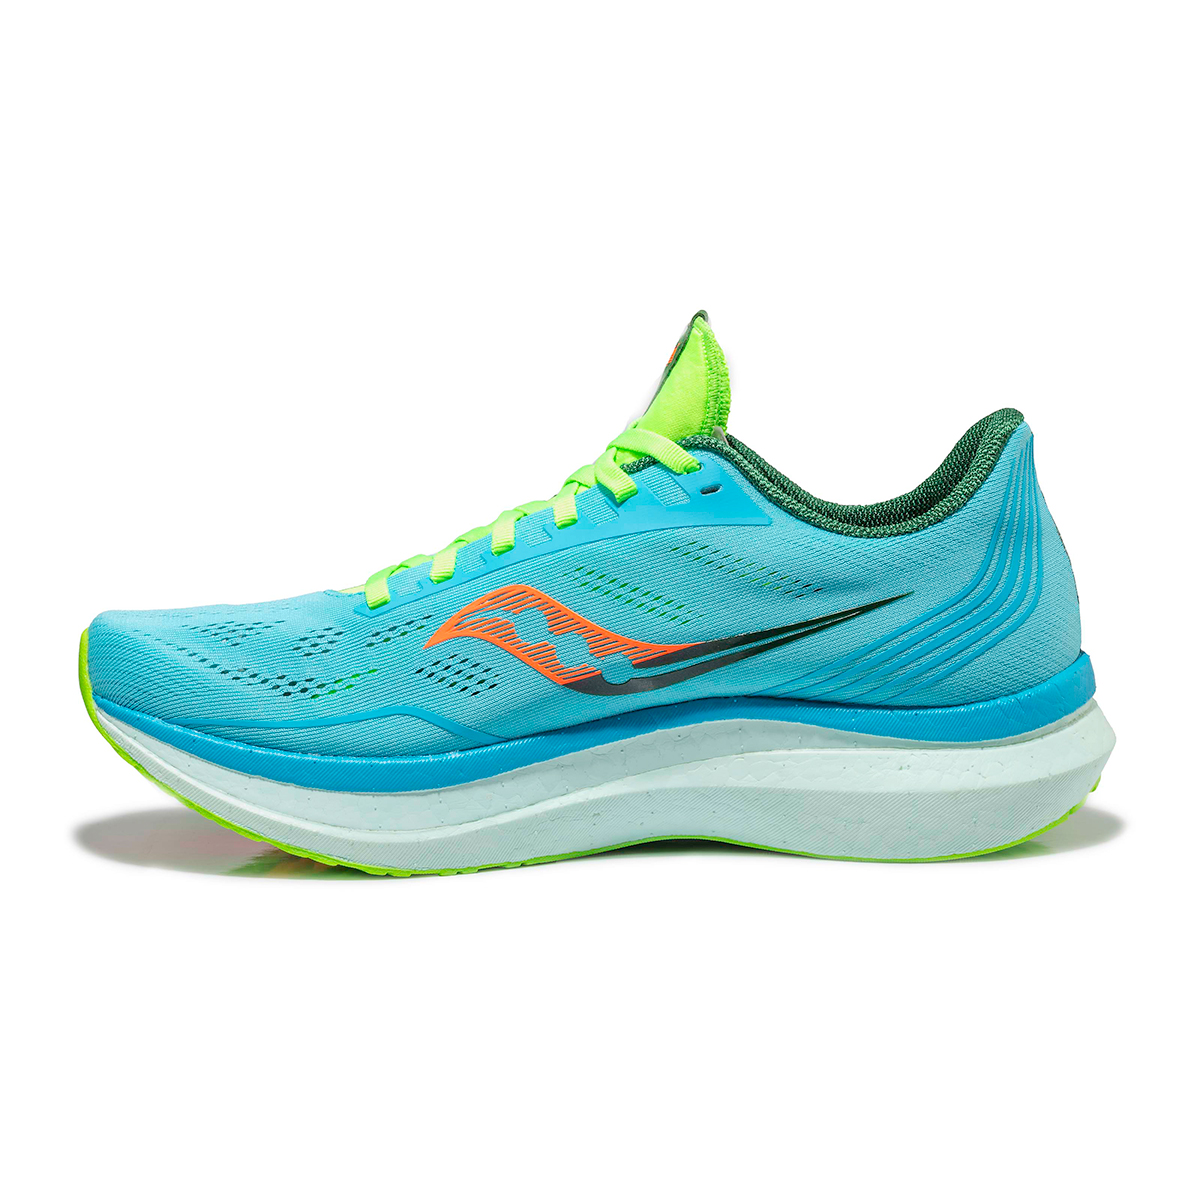 Men's Saucony Endorphin Pro Running Shoe - Color: Future/Blue - Size: 7 - Width: Regular, Future/Blue, large, image 2